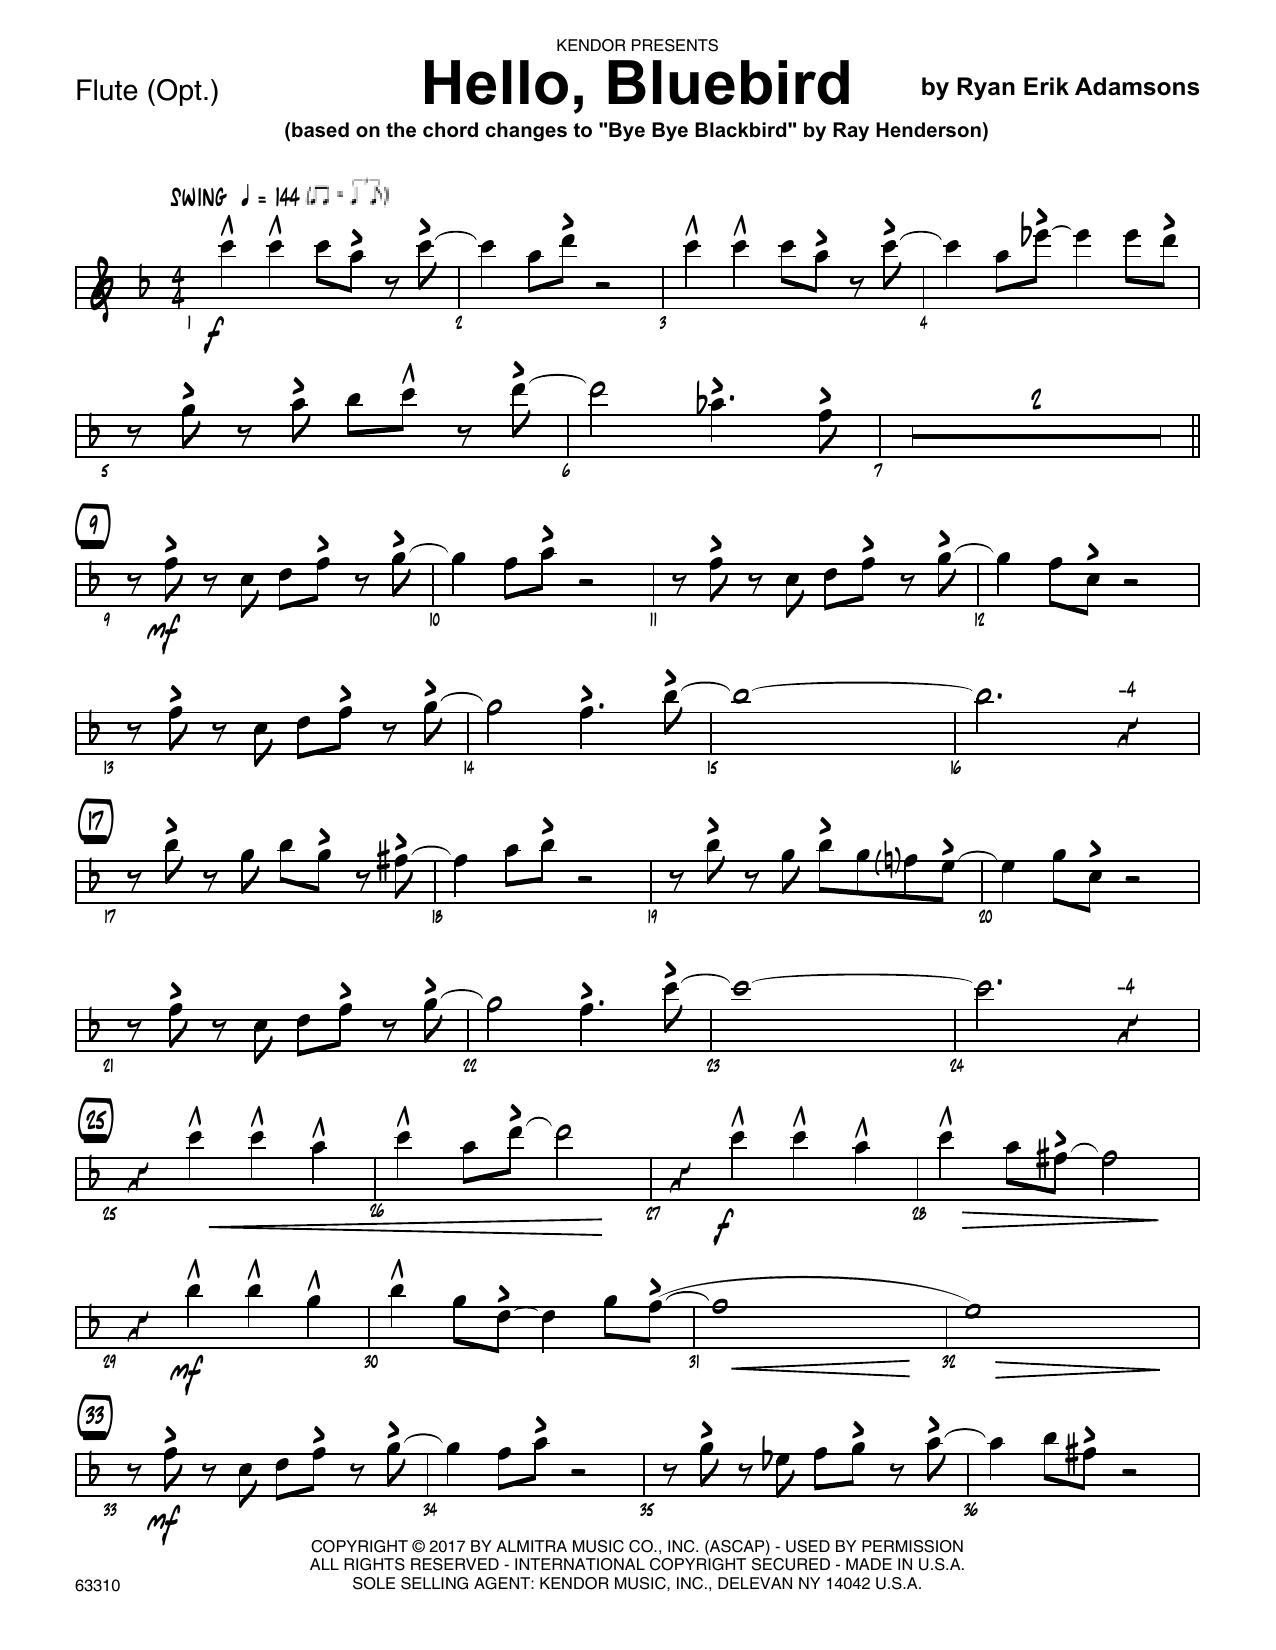 Ryan Erik Adamsons Hello, Bluebird (based on Bye Bye Blackbird) - Flute sheet music notes printable PDF score